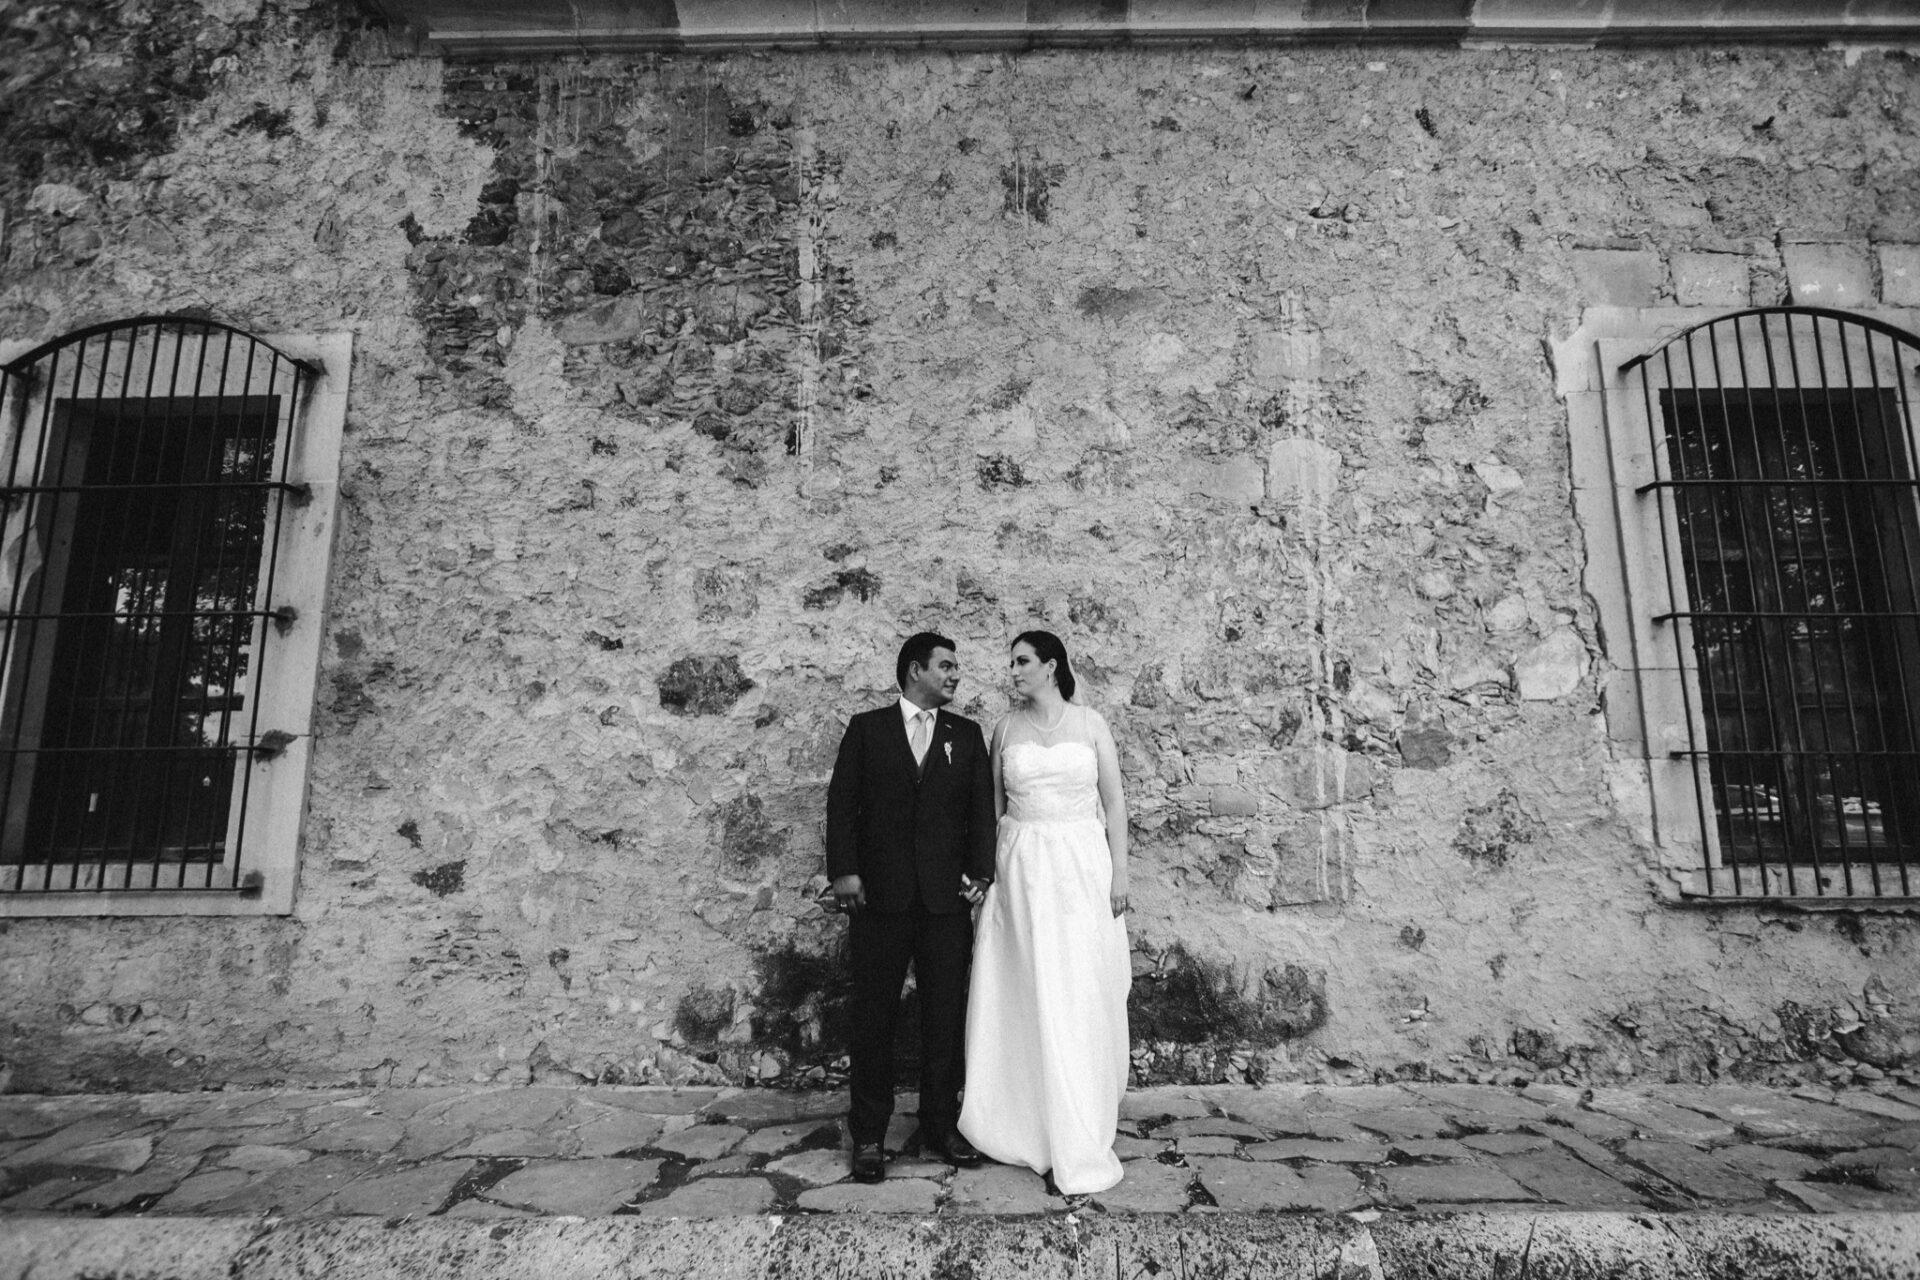 javier_noriega_fotografo_bodas_centro_platero_zacatecas_wedding_photographer24